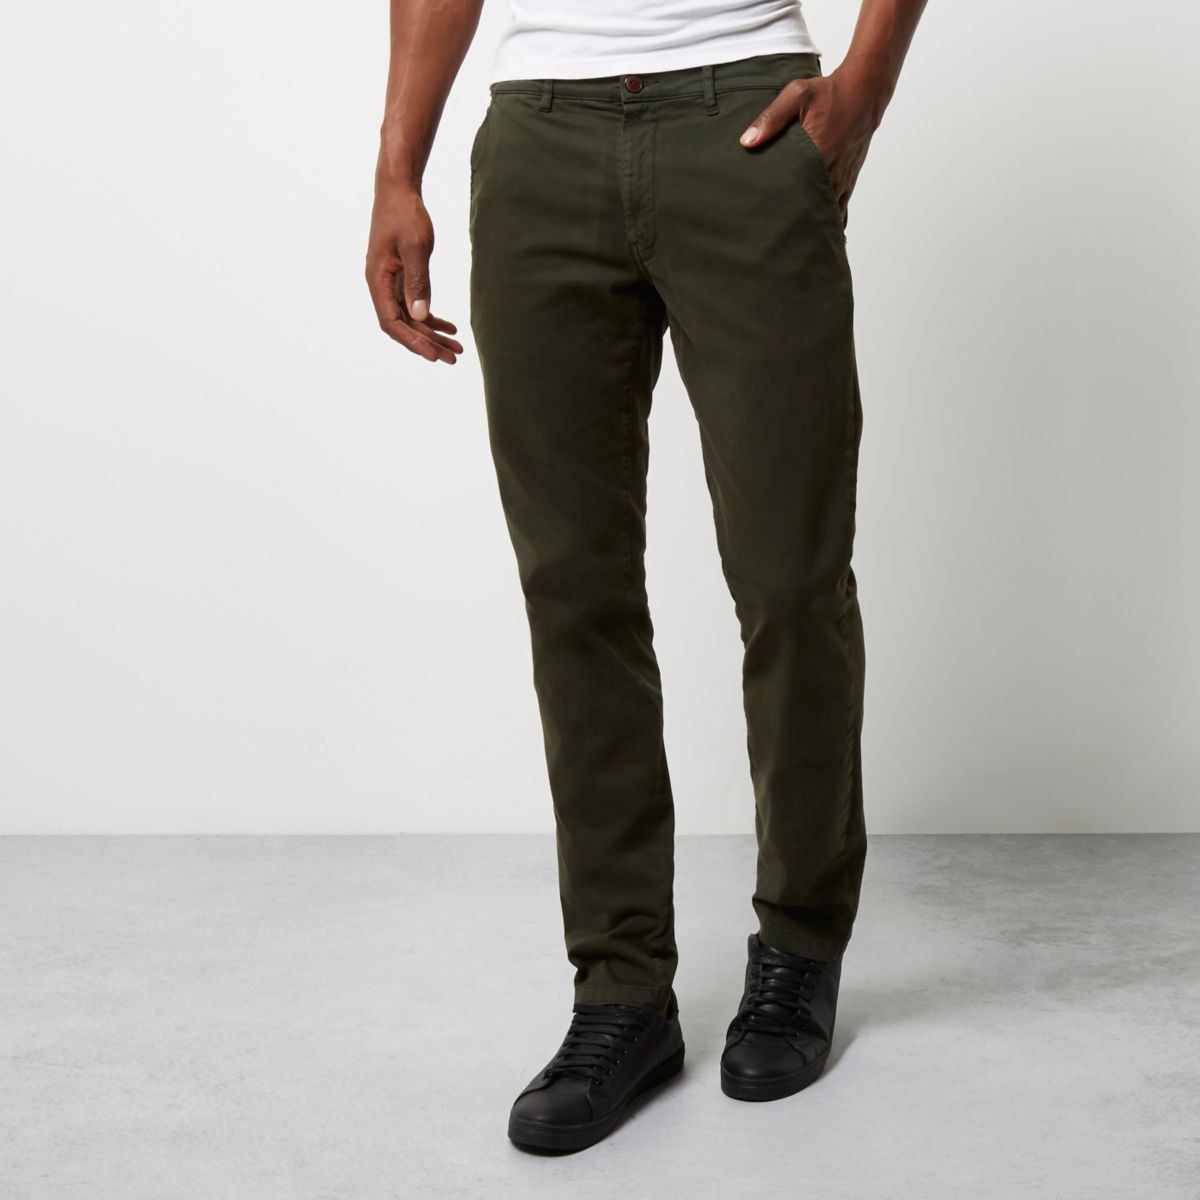 Khaki Franklin & Marshall skinny pants